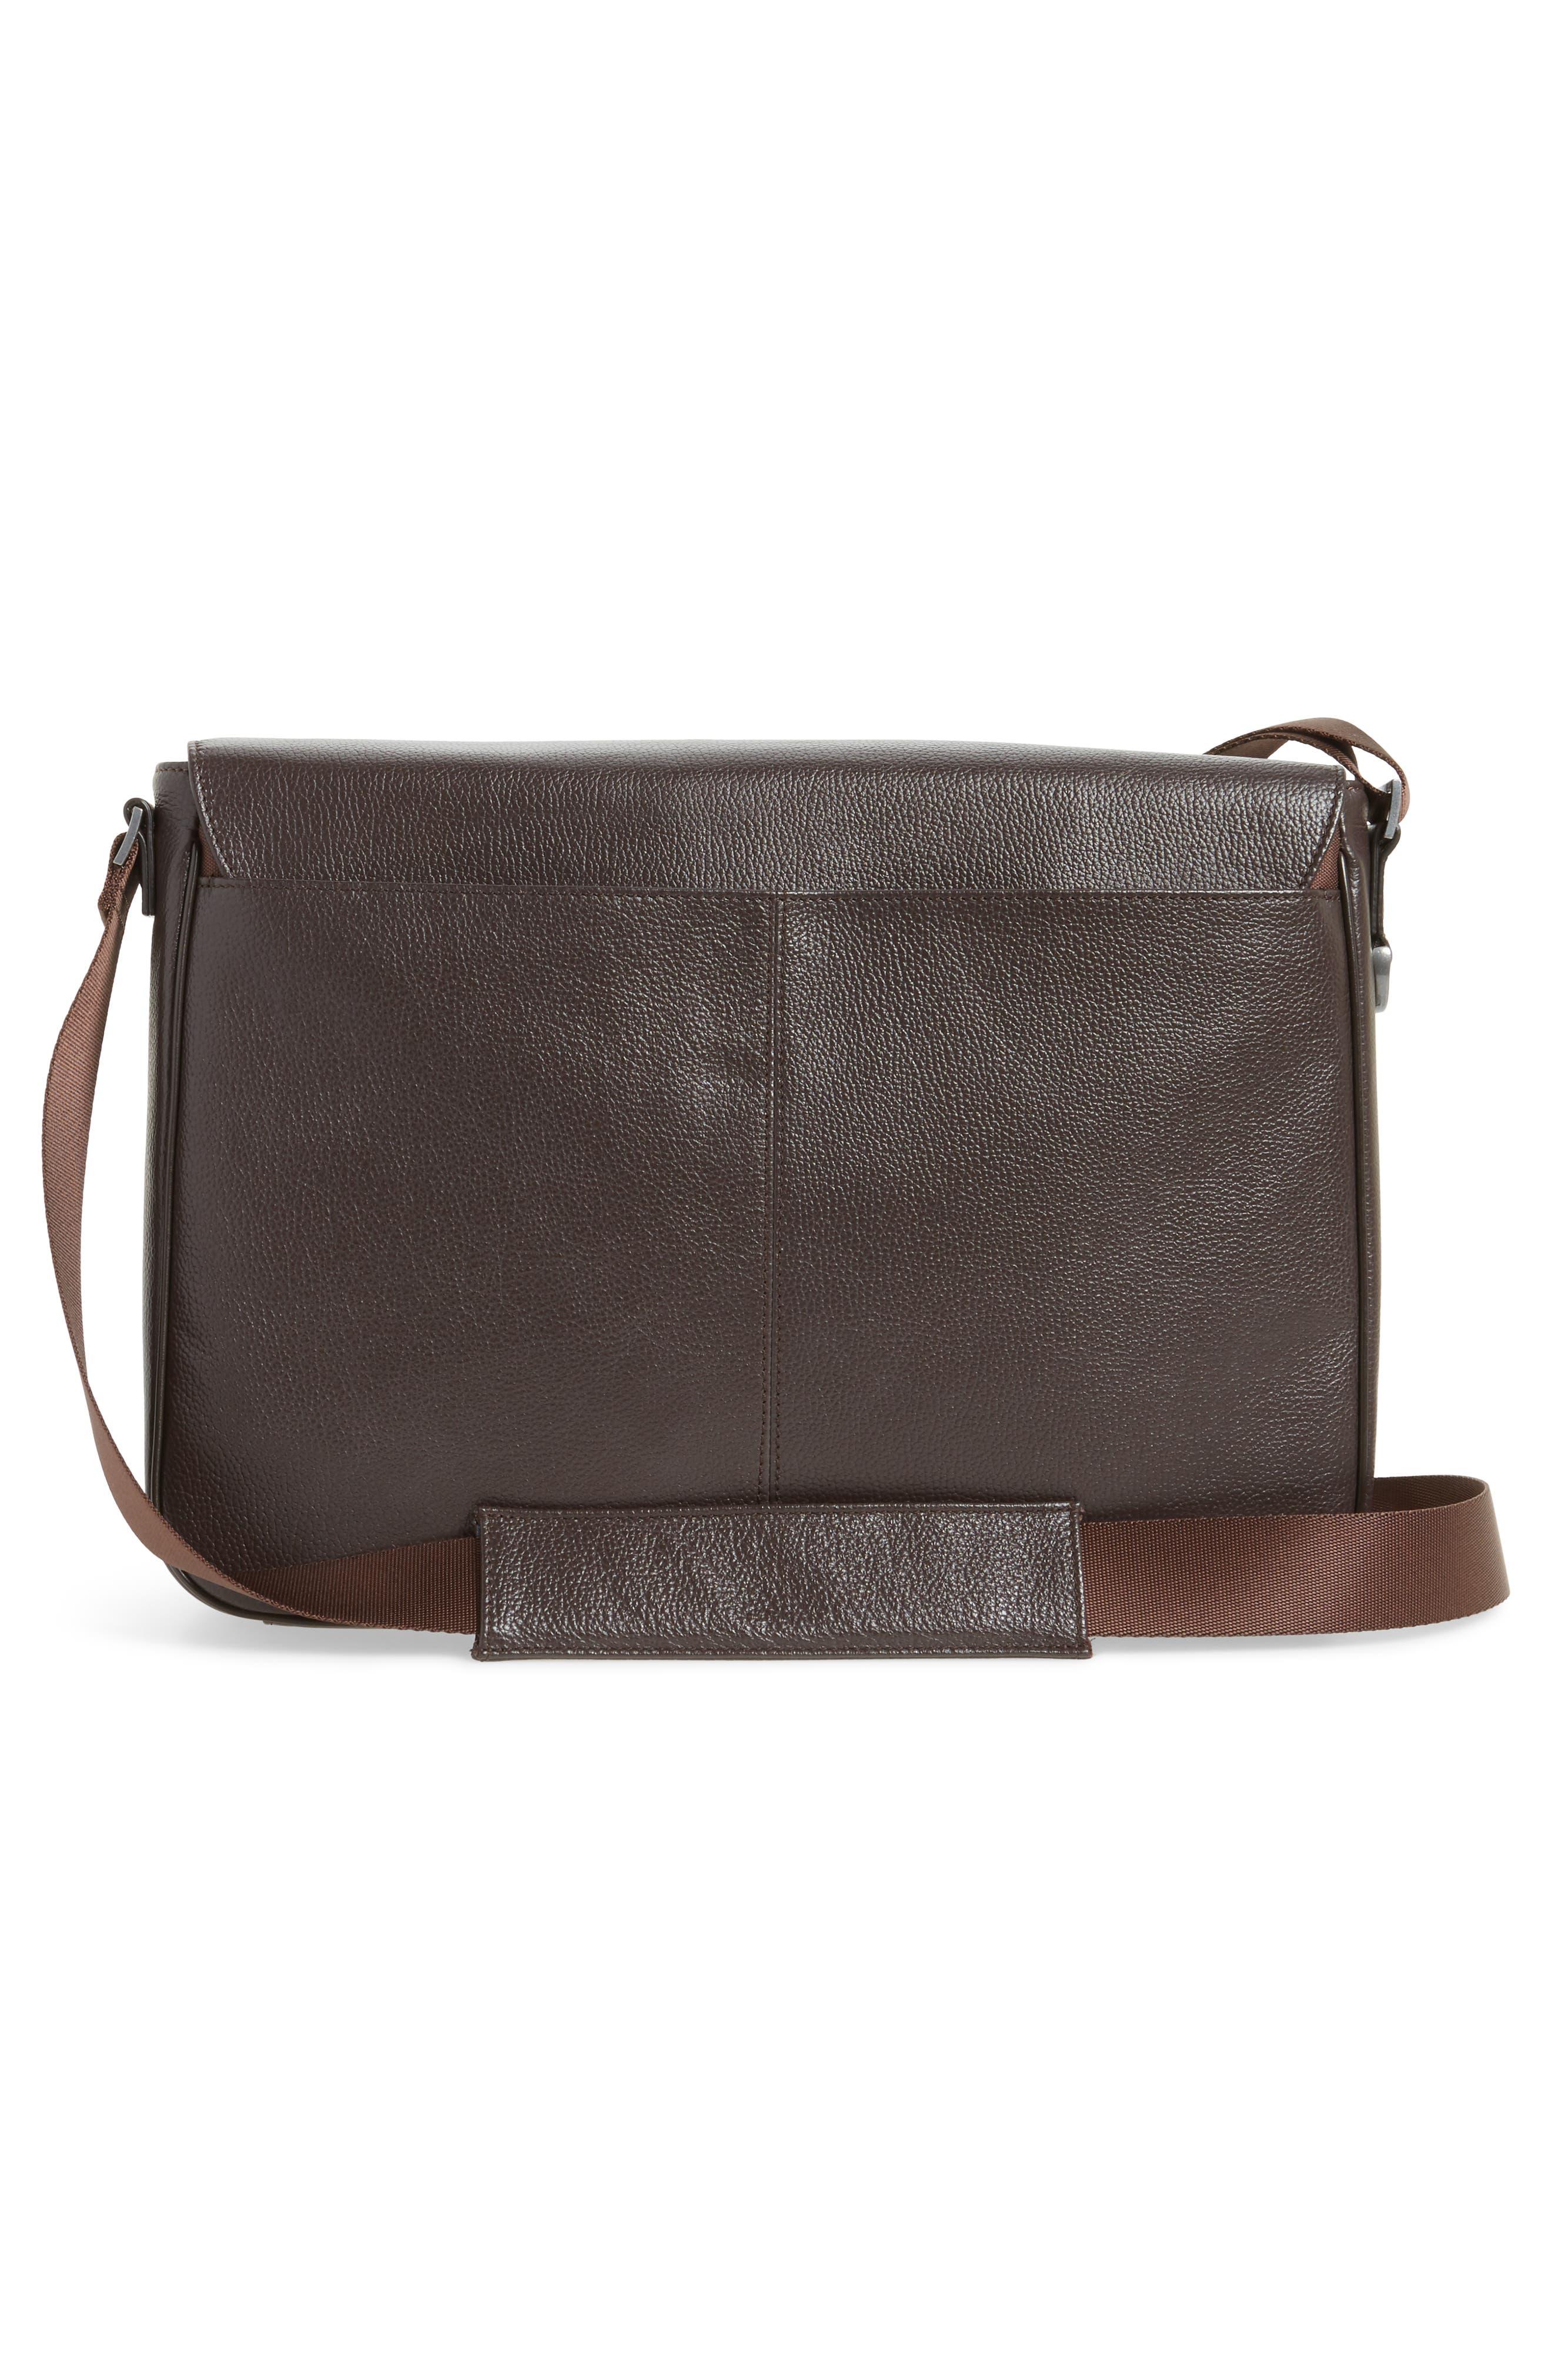 Midland Leather Messenger Bag,                             Alternate thumbnail 3, color,                             BROWN